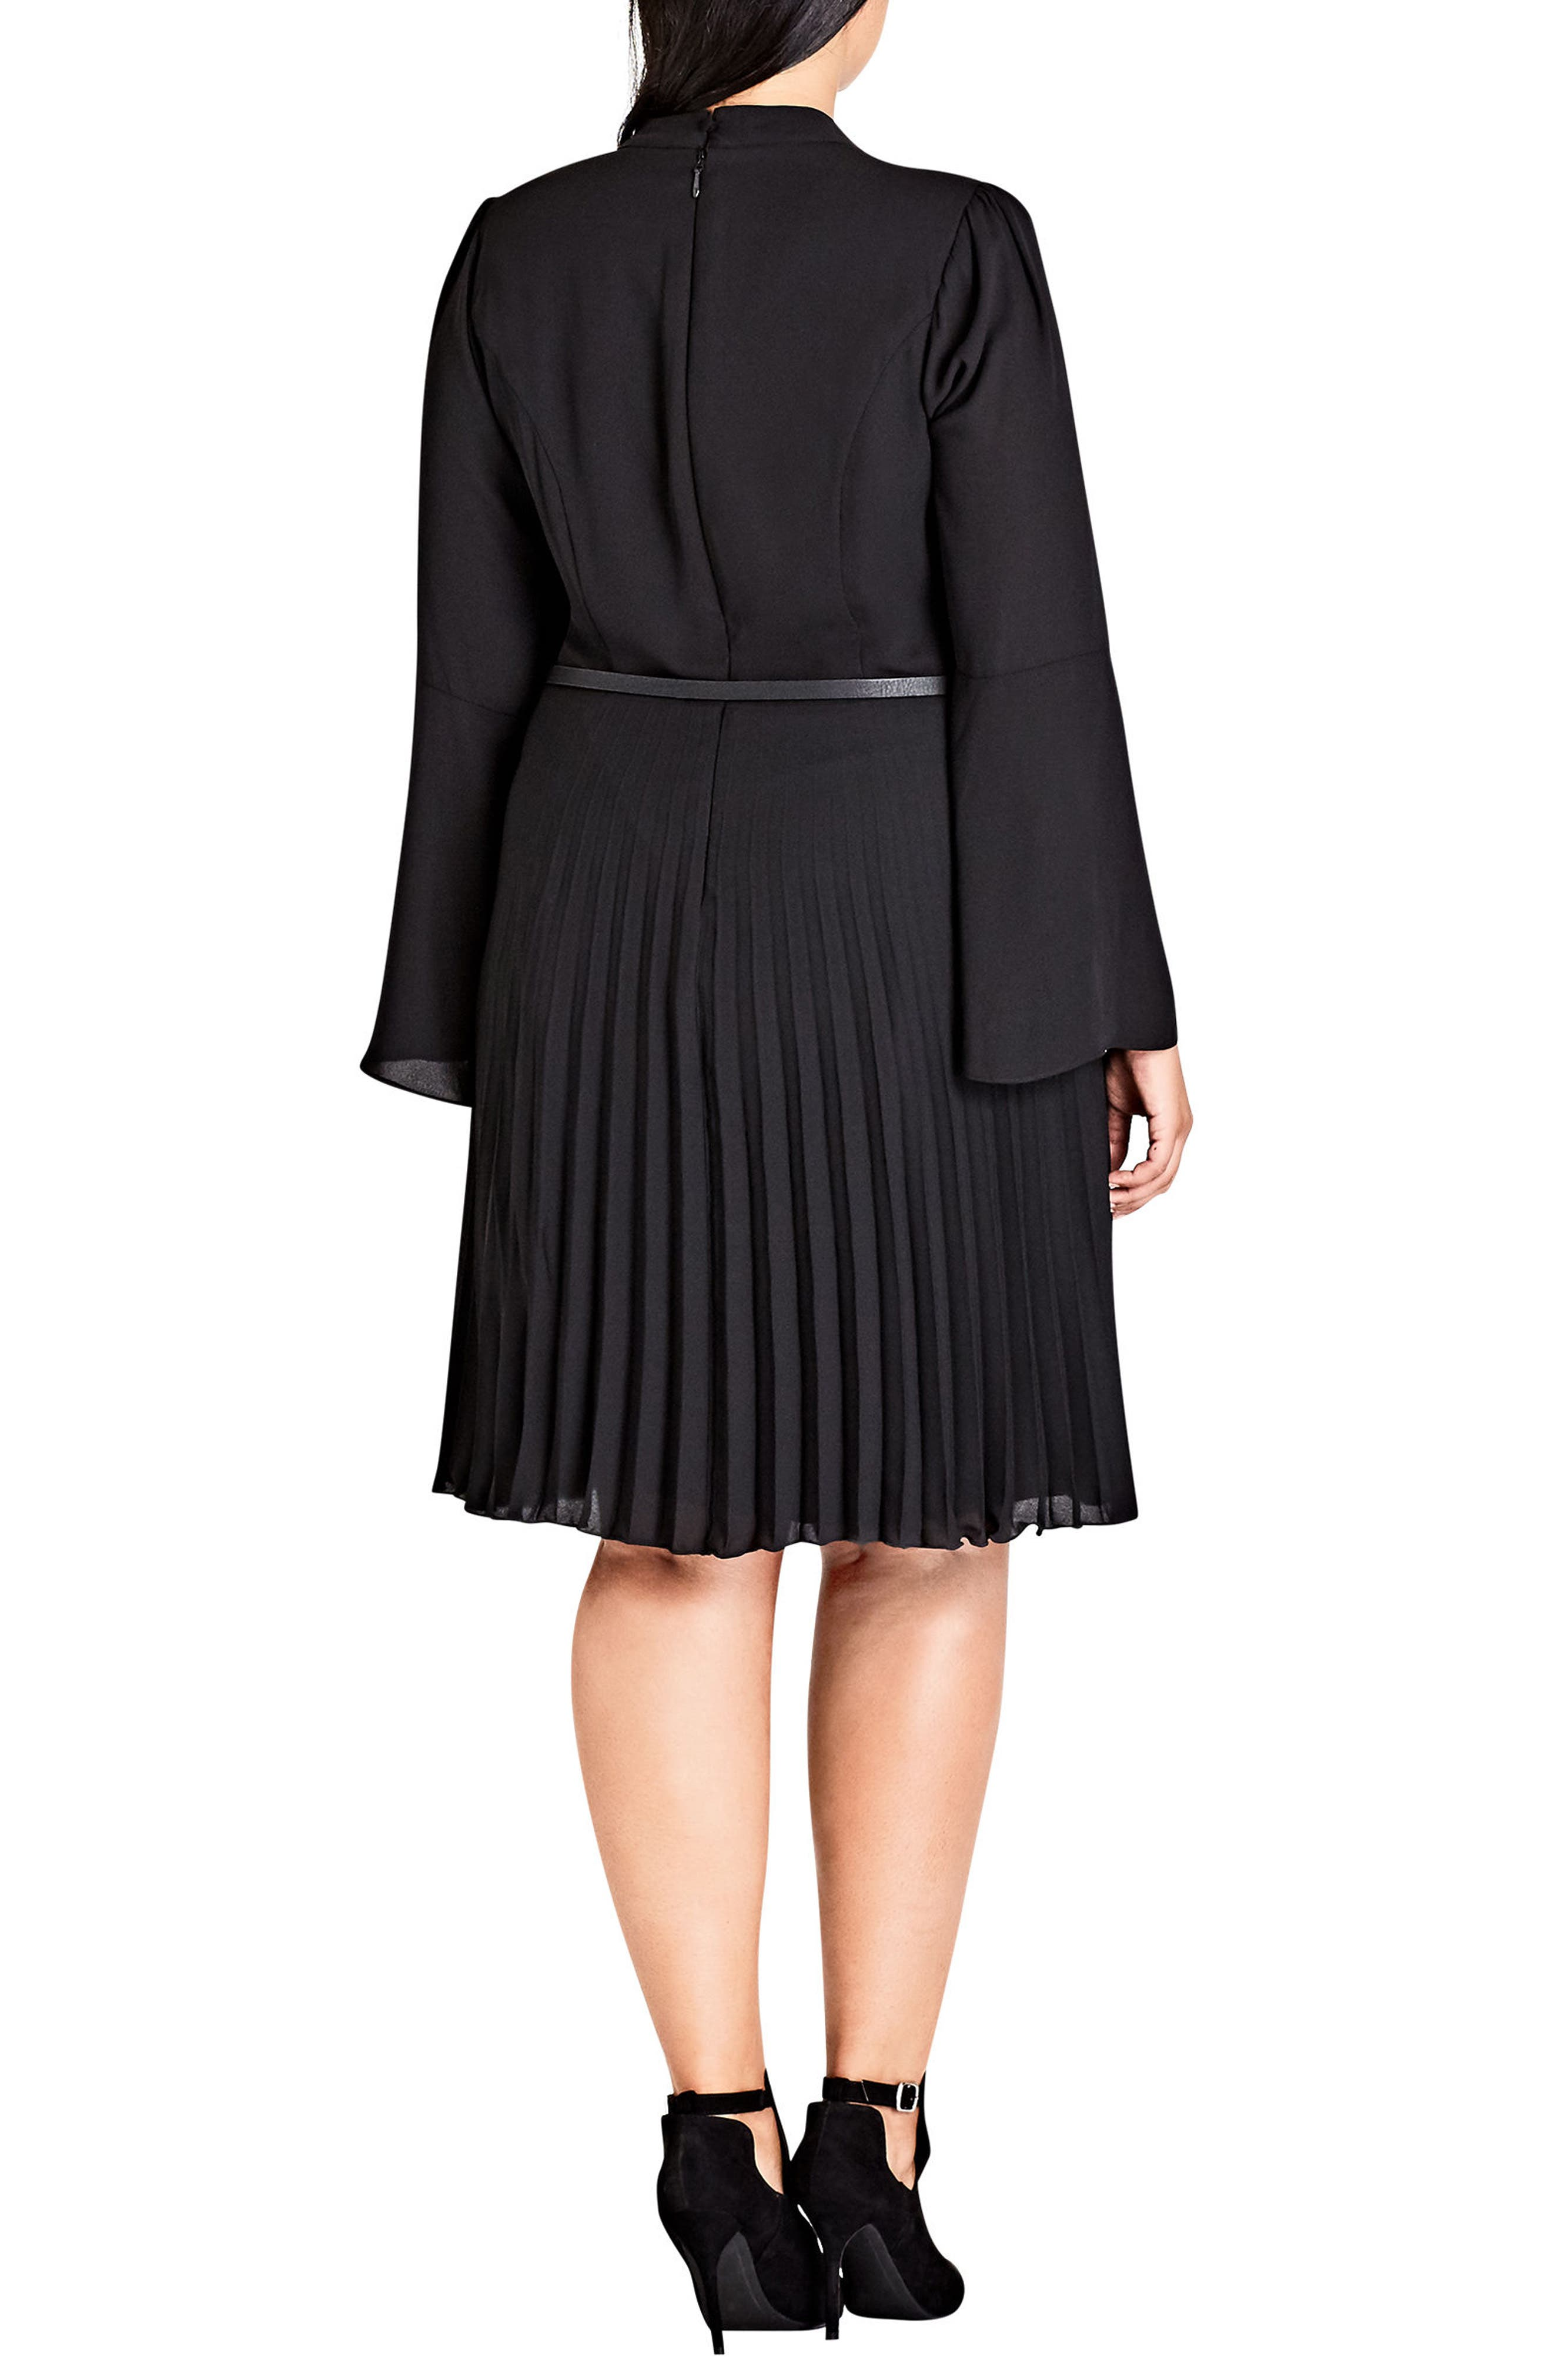 Alternate Image 2  - City Chic Praise Me Bell Sleeve Choker Neck Dress (Plus Size)